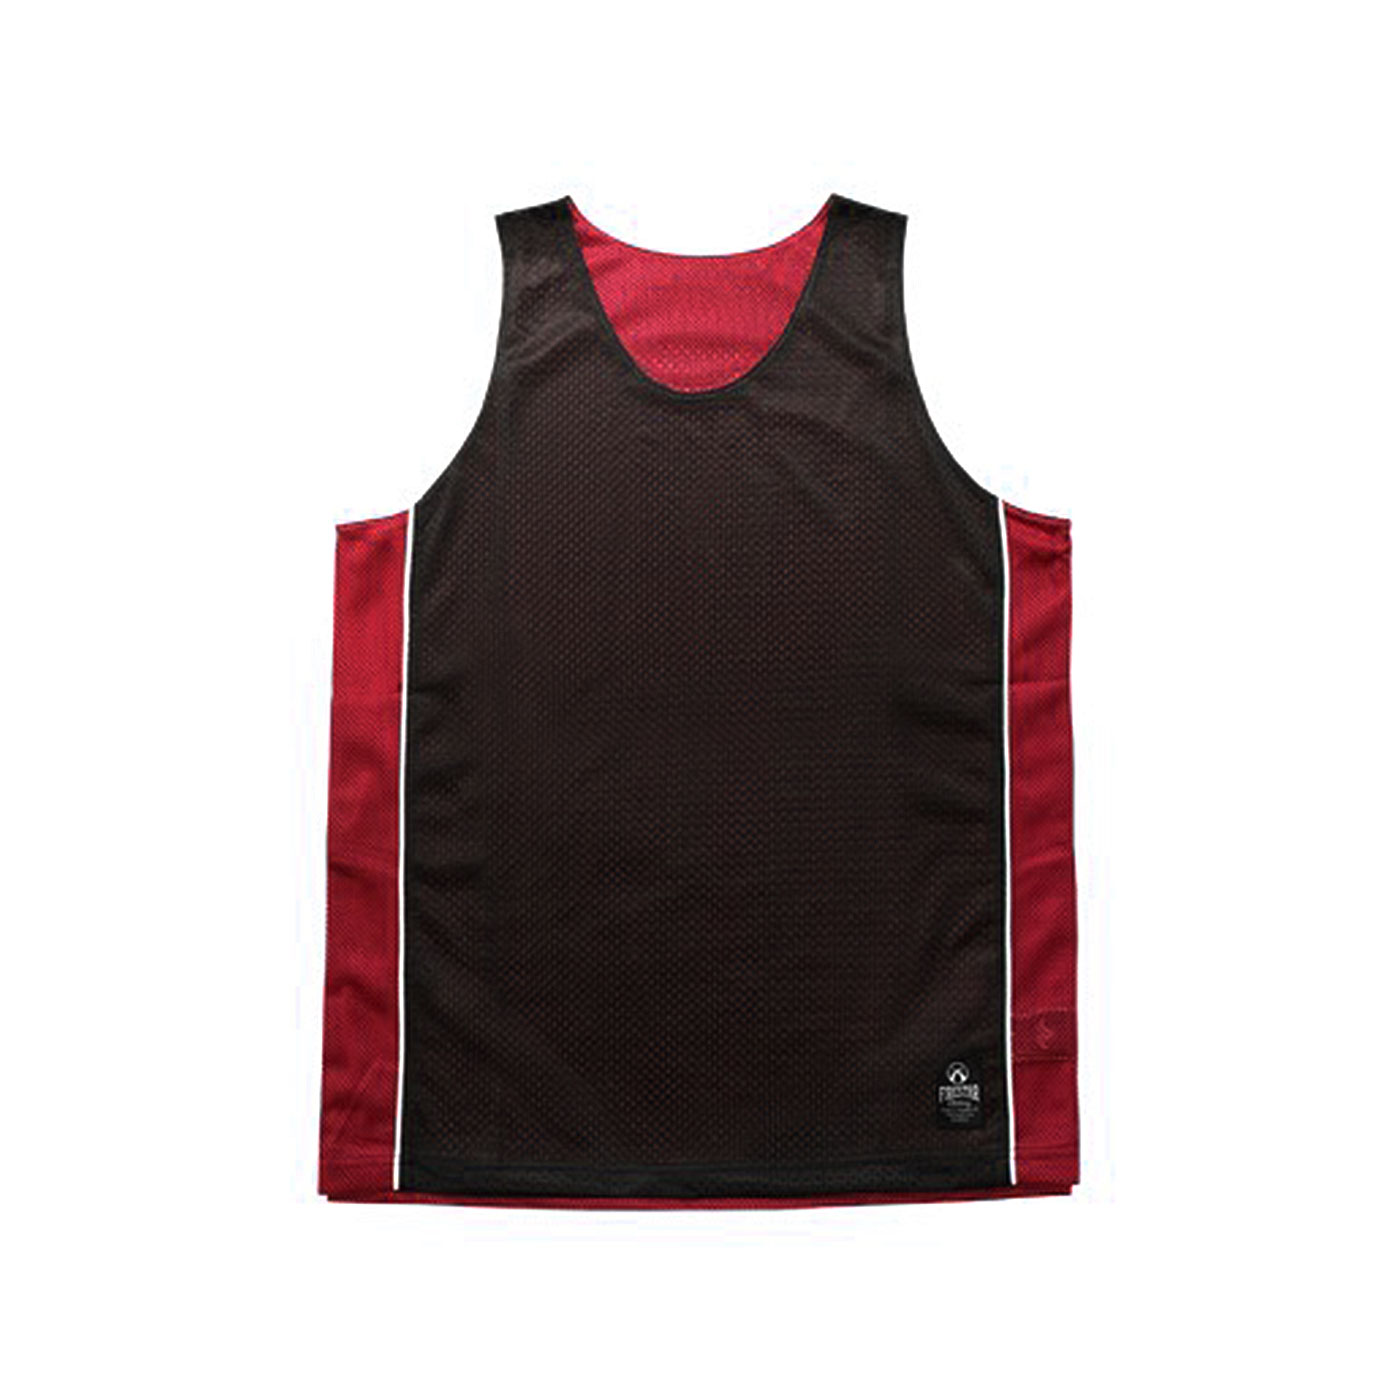 FIRESTAR 籃球背心 B3707-10 - 黑紅